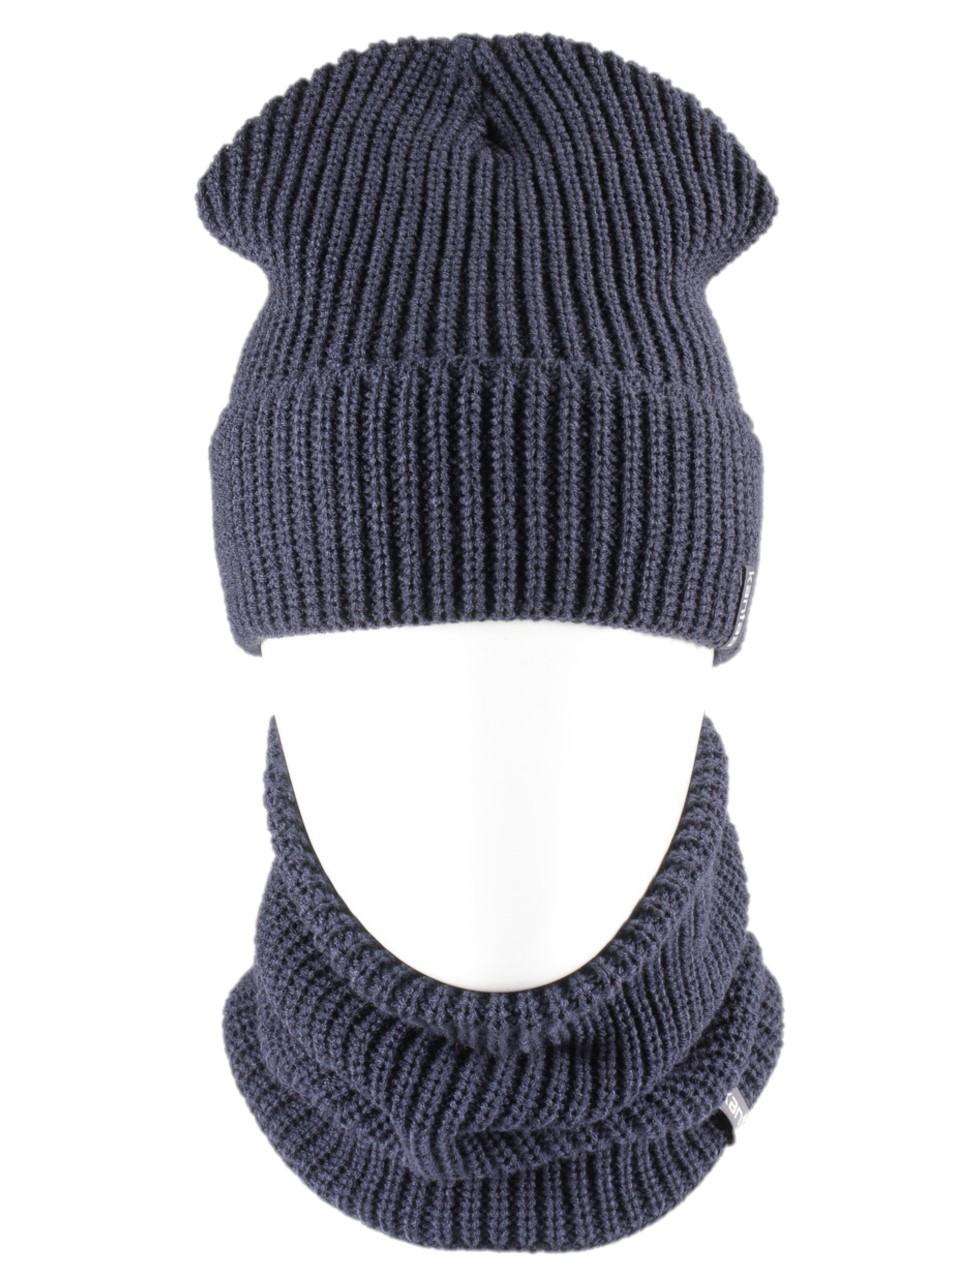 Вязаная шапка с Buff снуд КАНТА унисекс размер взрослый, синий (OC-089)